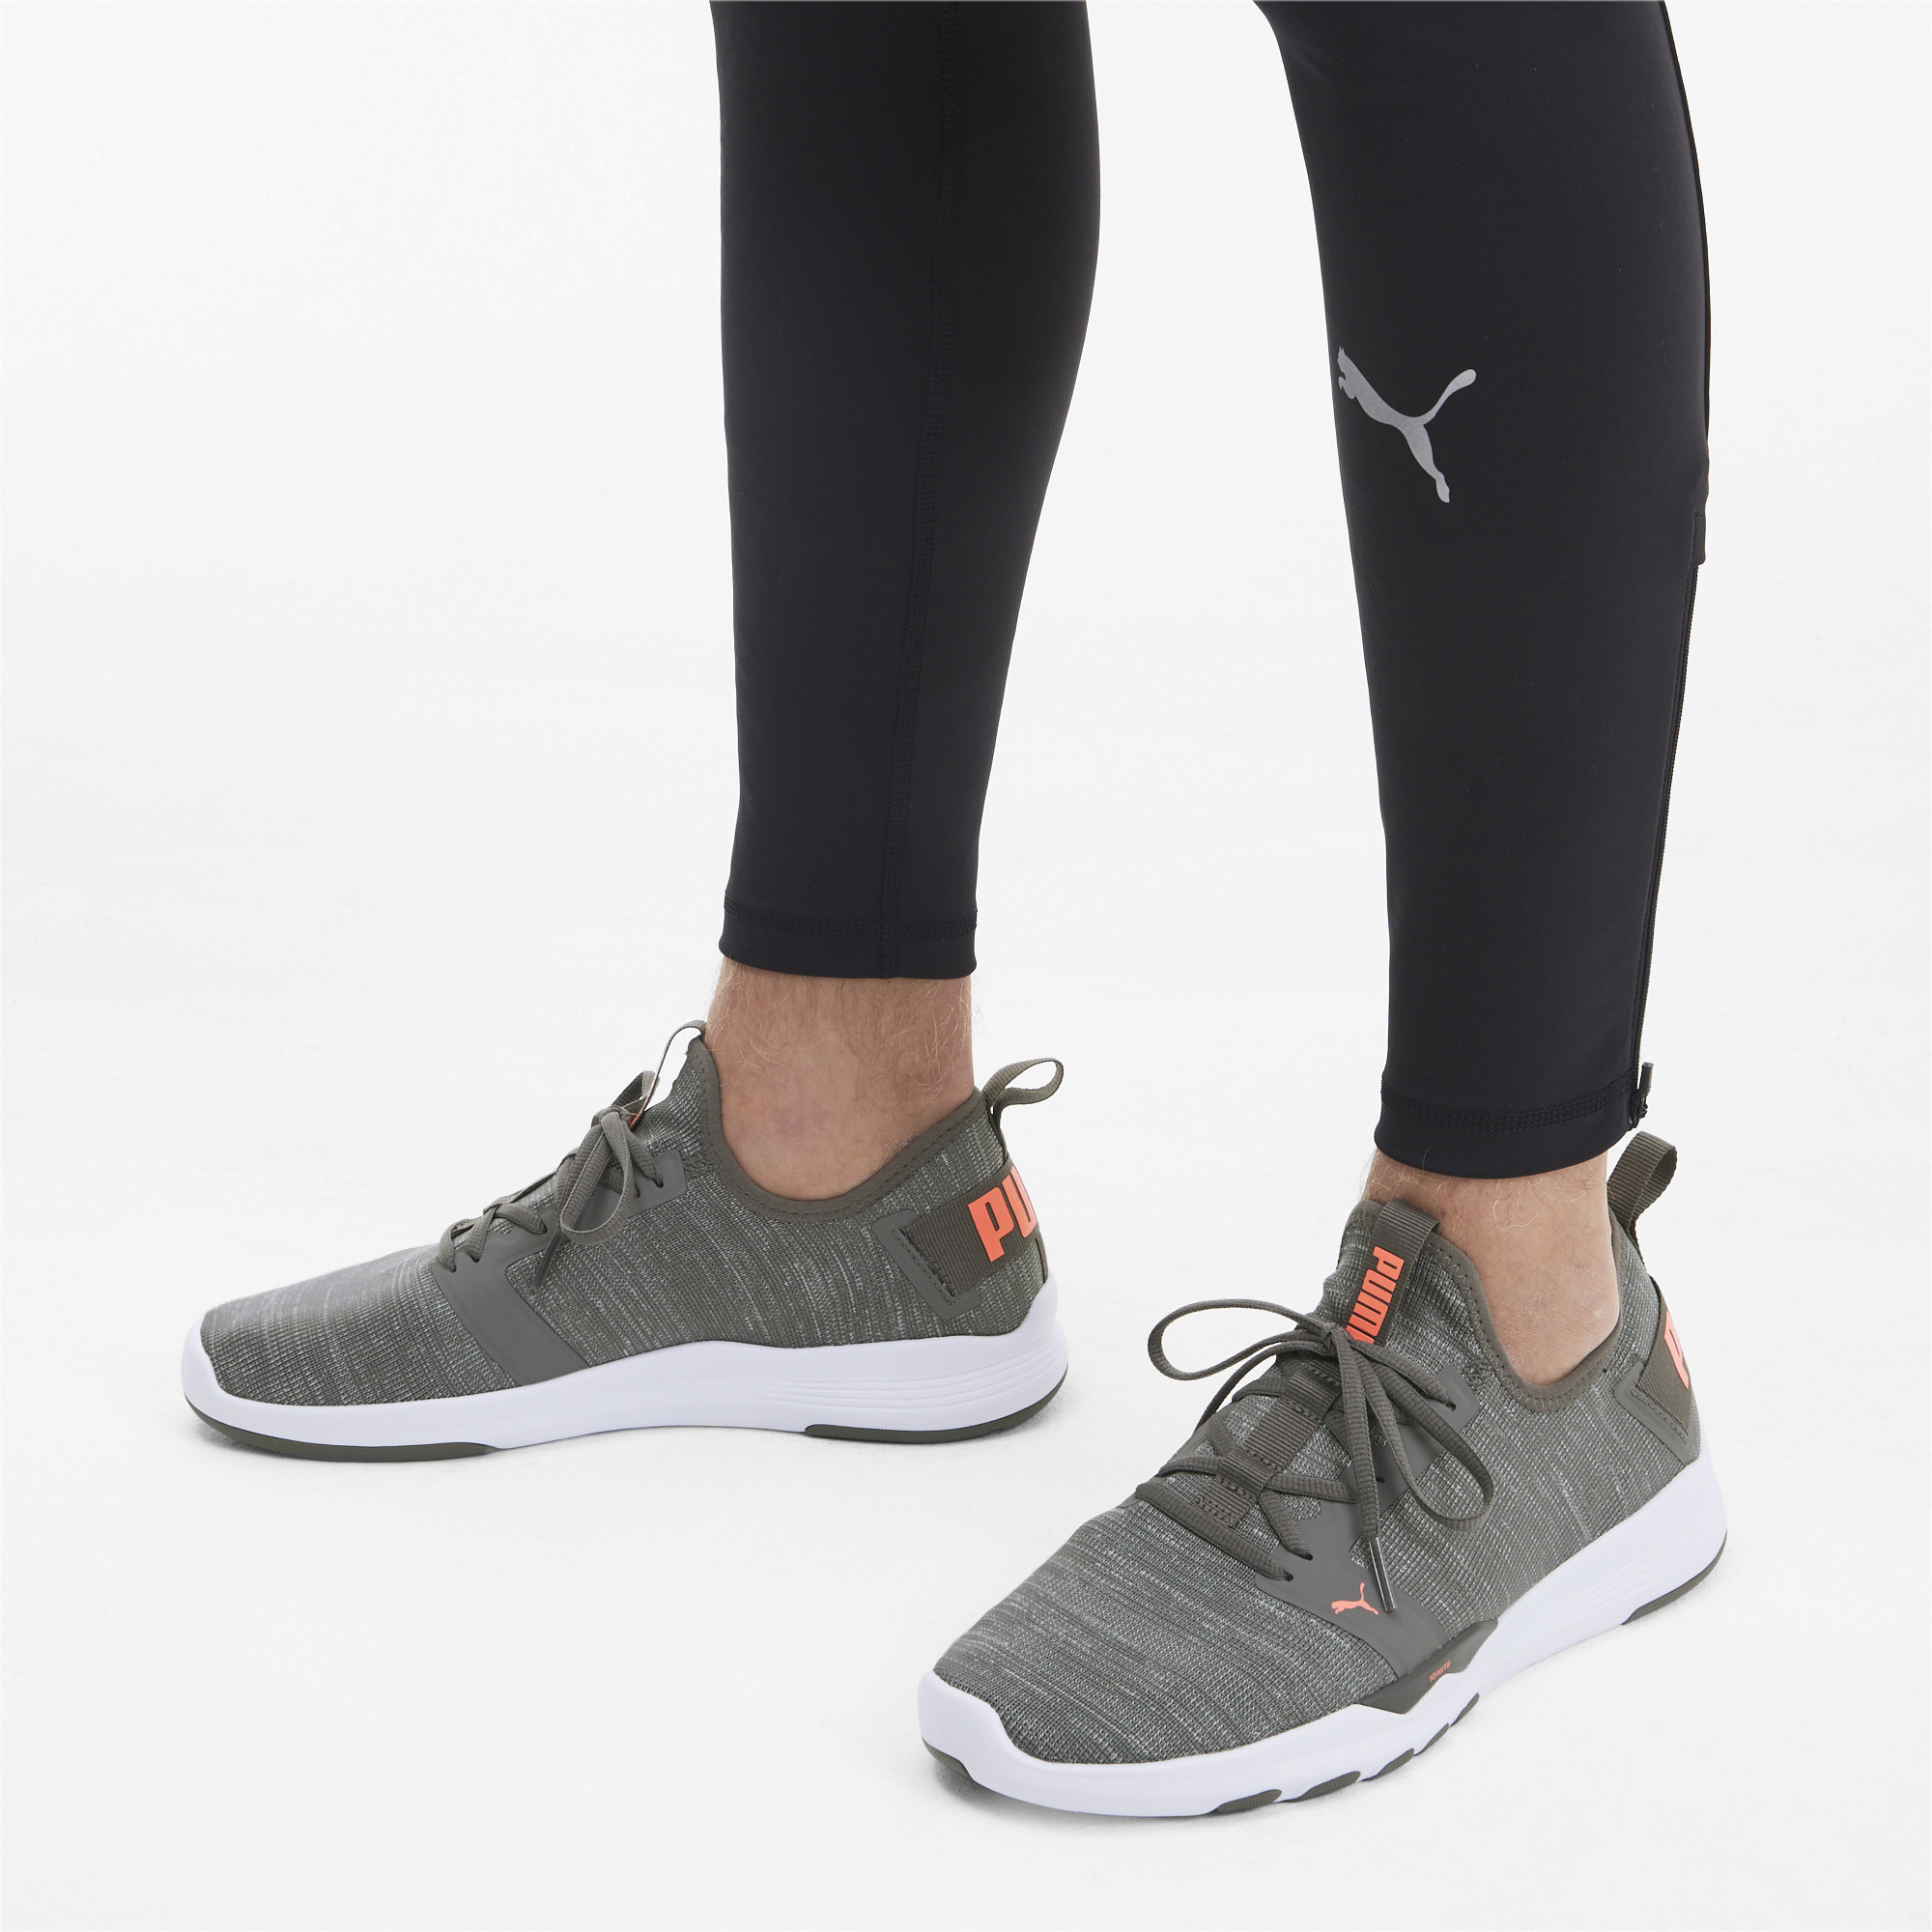 PUMA-Men-039-s-IGNITE-Contender-Knit-Running-Shoes thumbnail 5